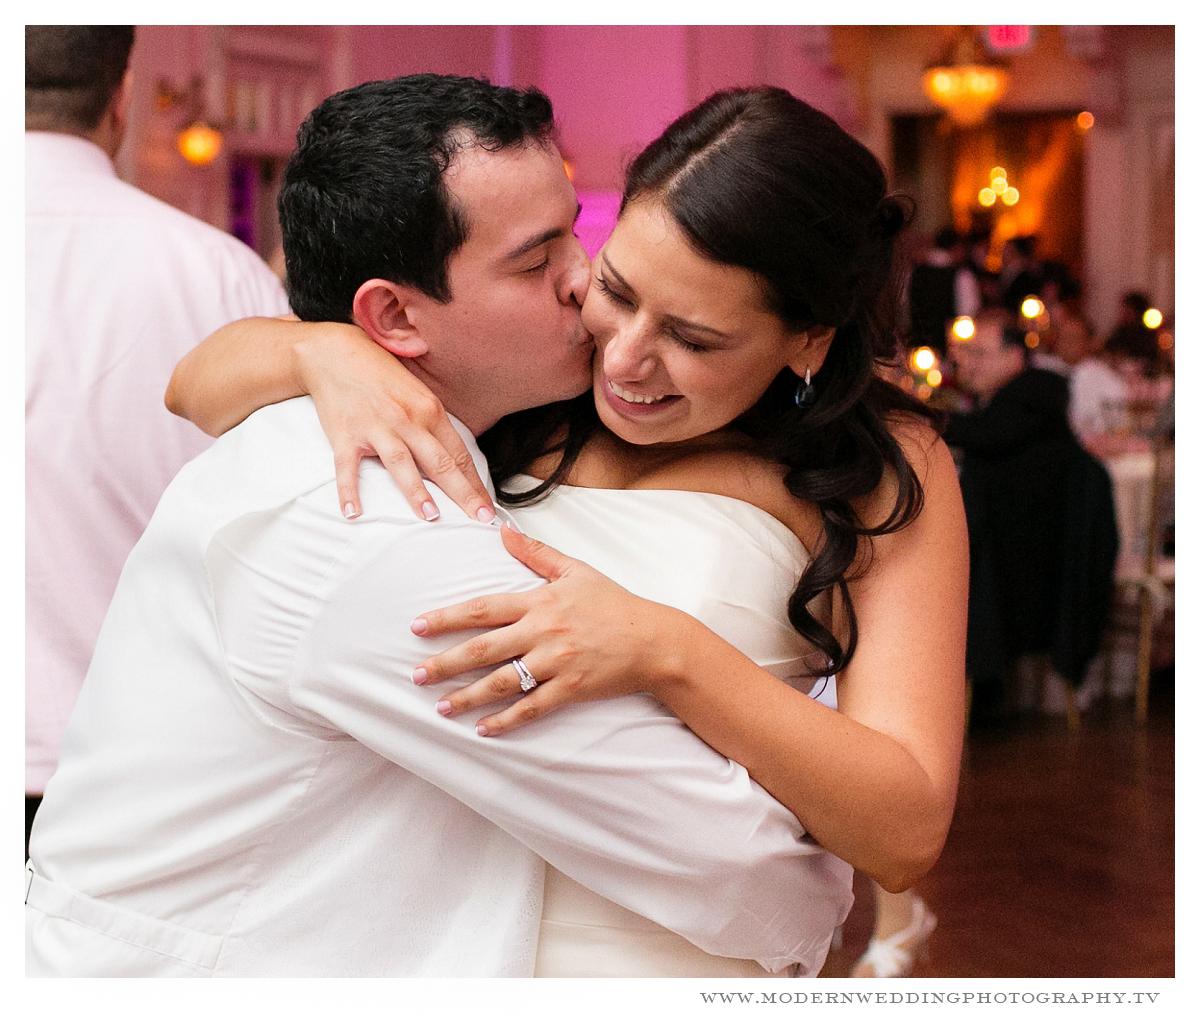 Modern Wedding Photography 0932 .jpg